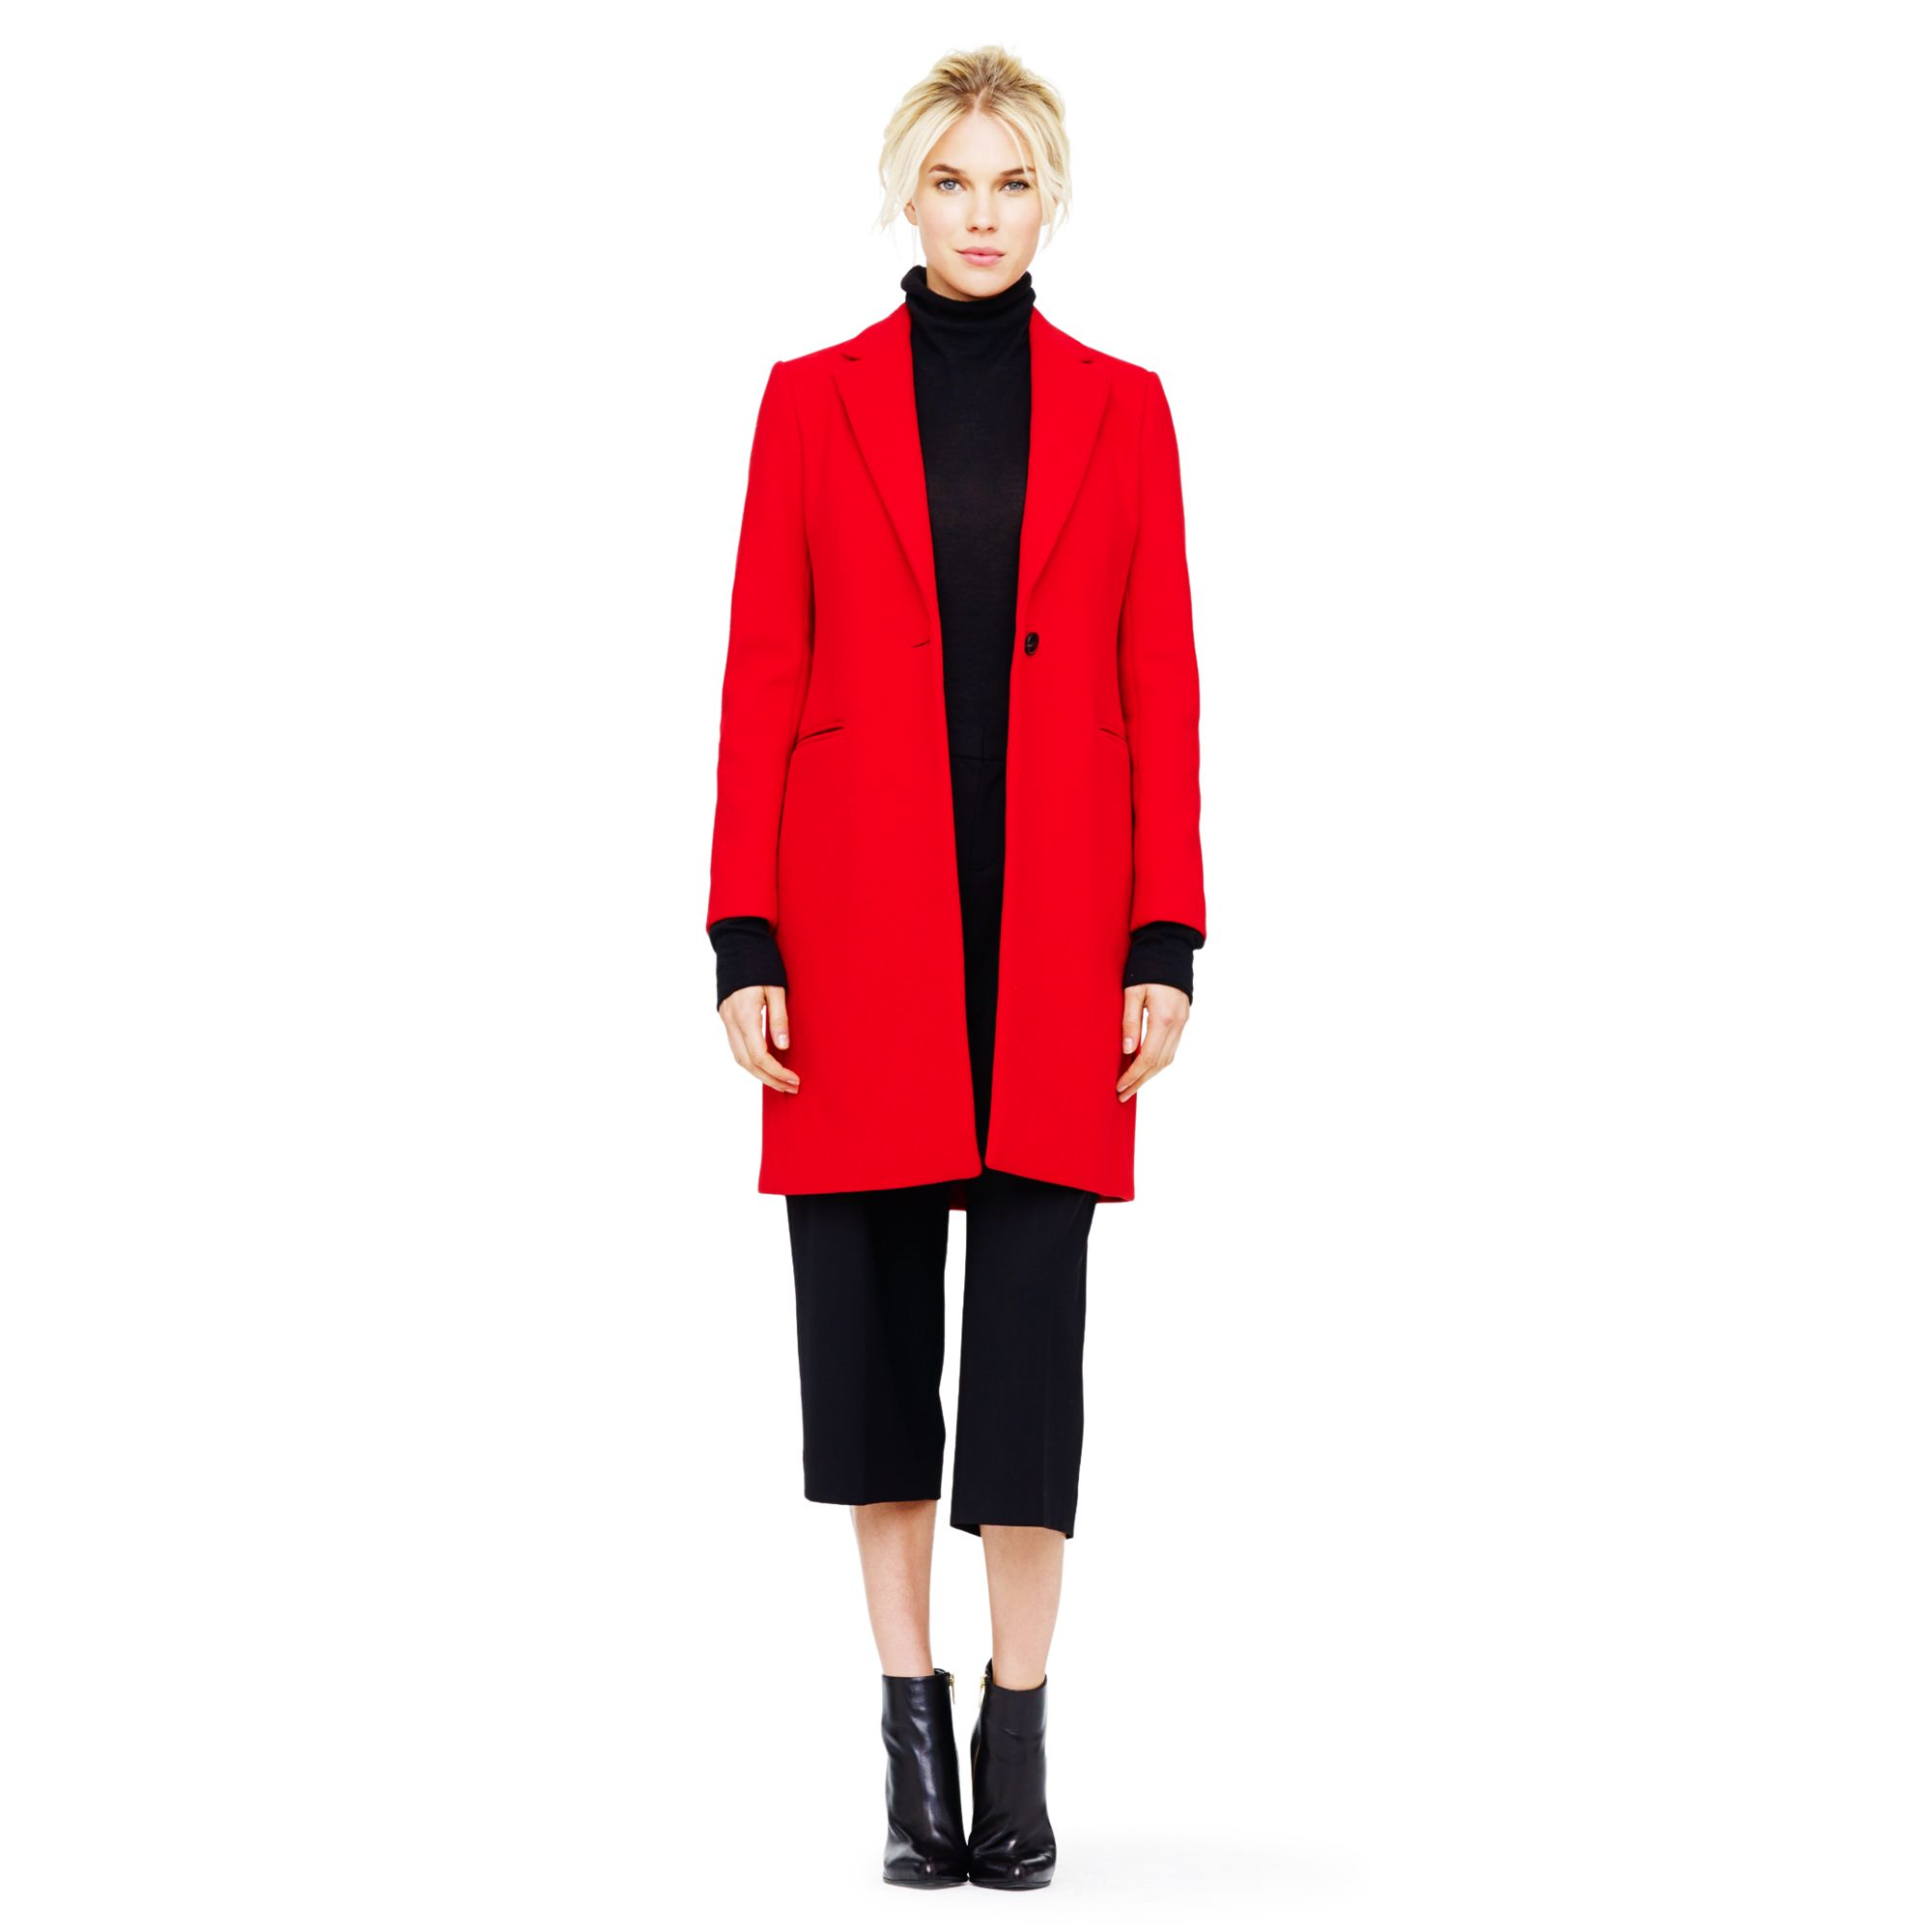 Club monaco Selina Double-face Wool Coat in Red   Lyst